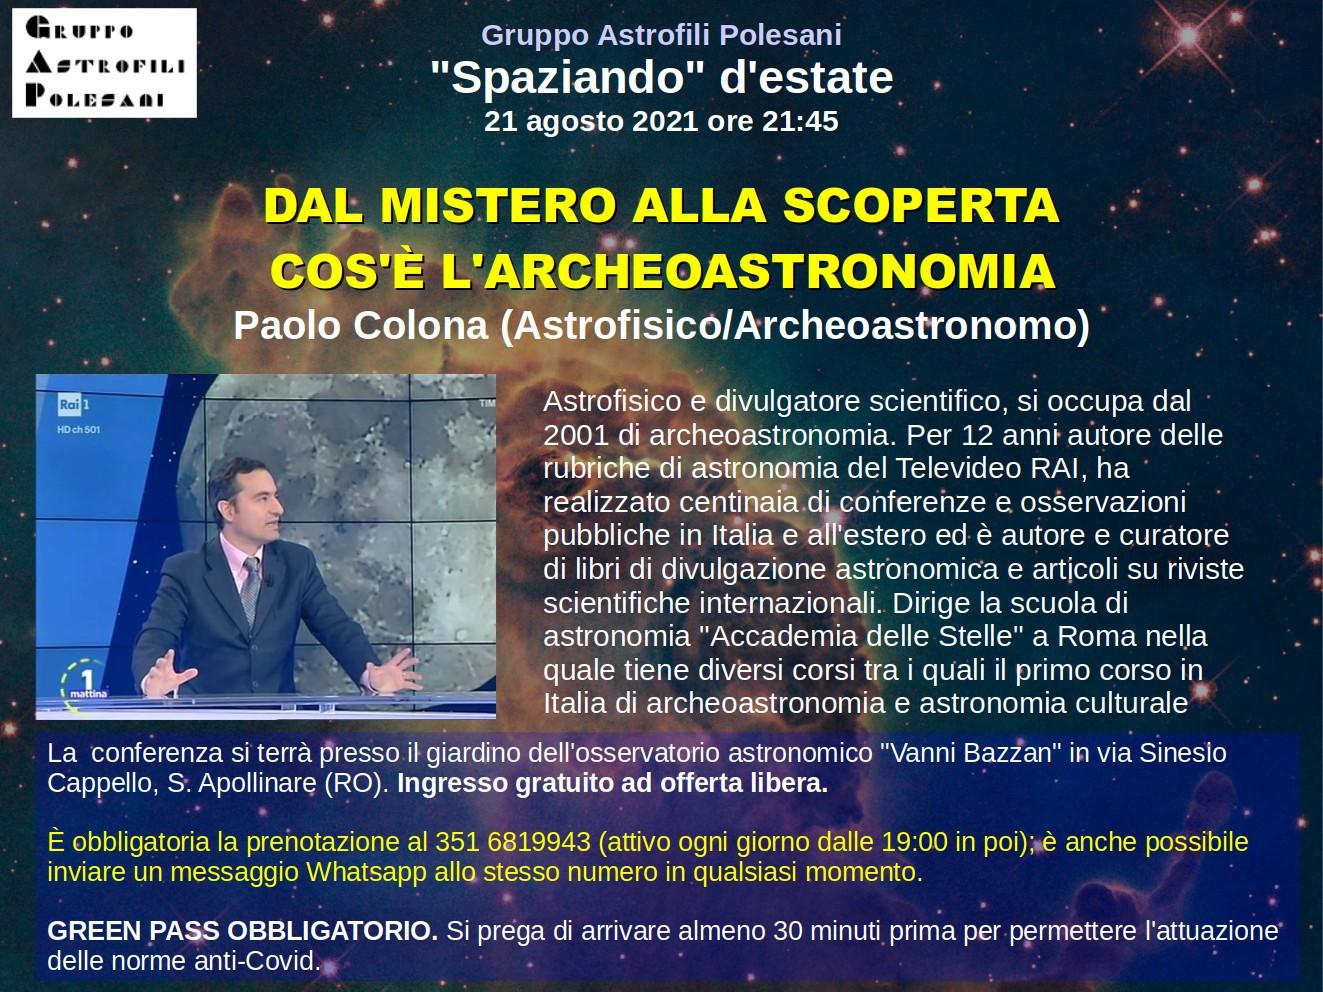 Archeoastronomia: Conferenza a Rovigo